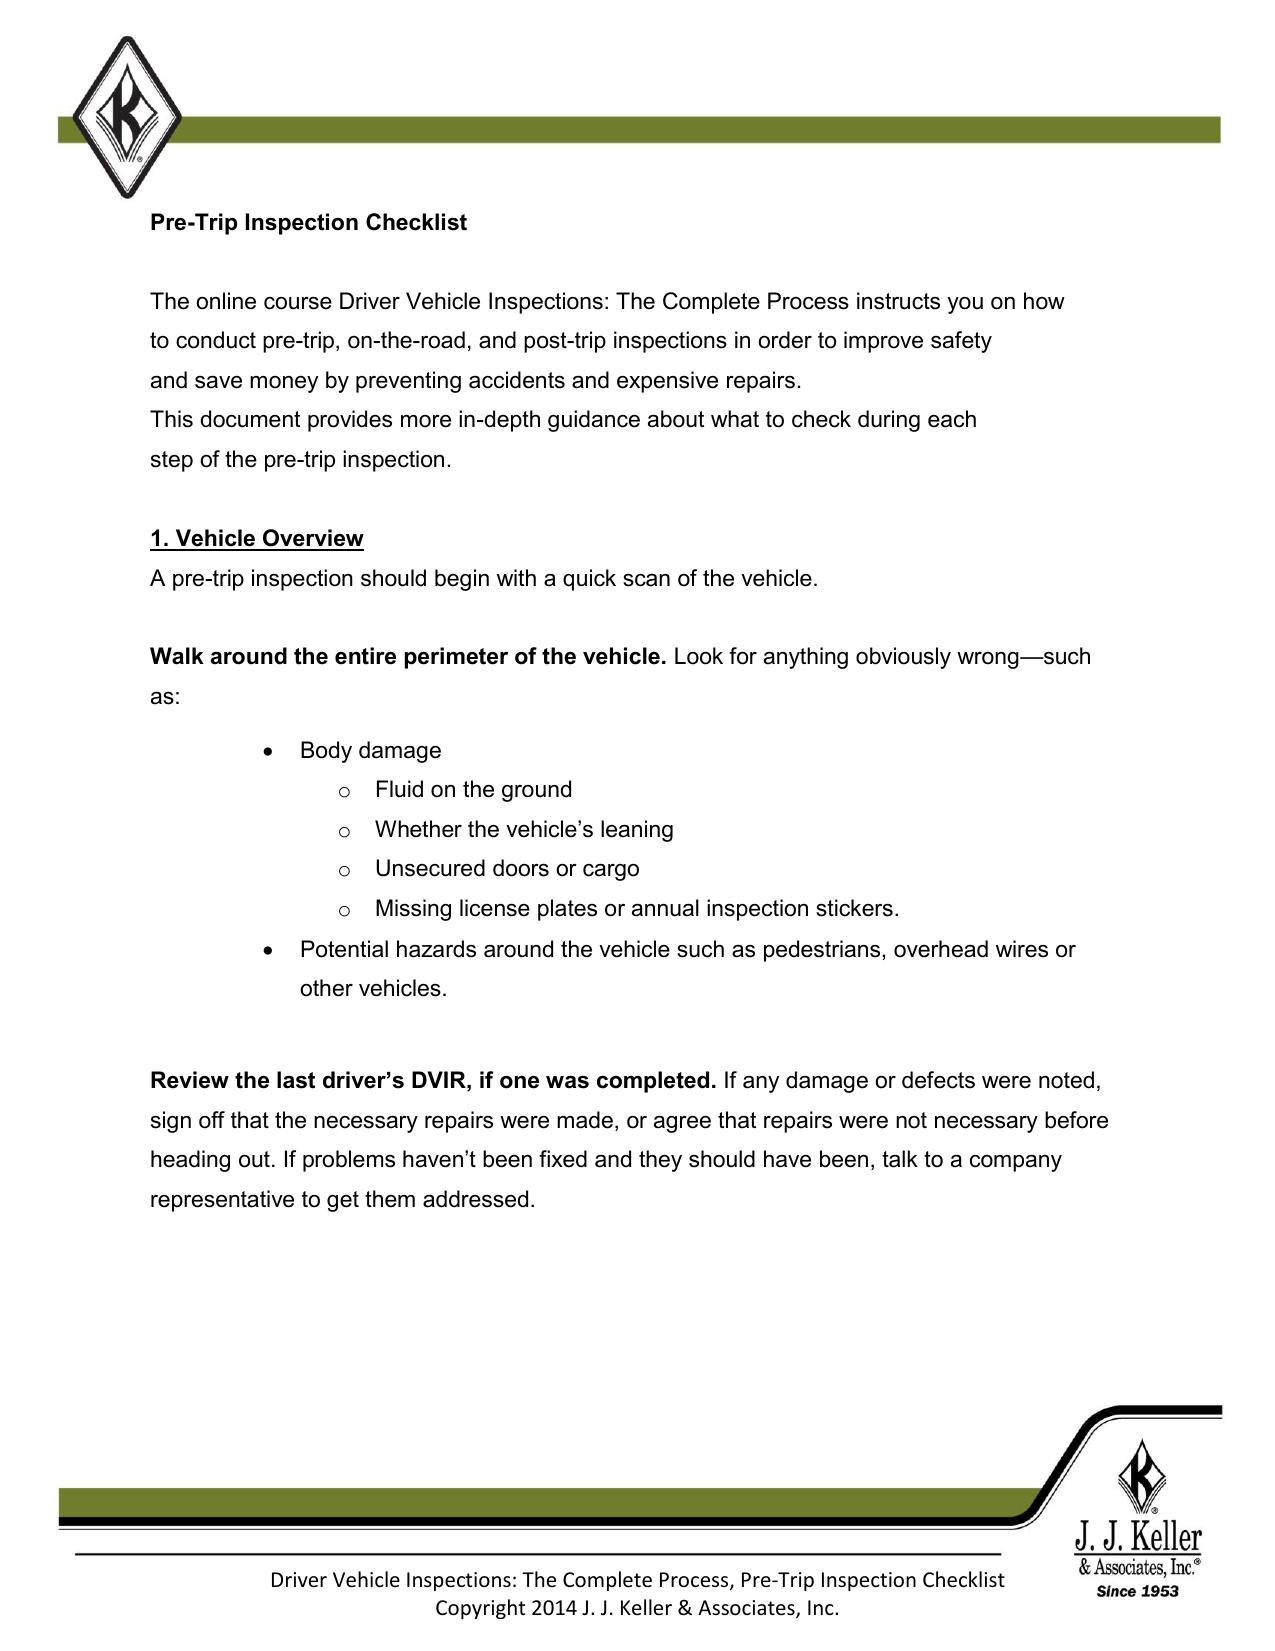 Driver Vehicle Inspections - JJ Keller® Training Portal